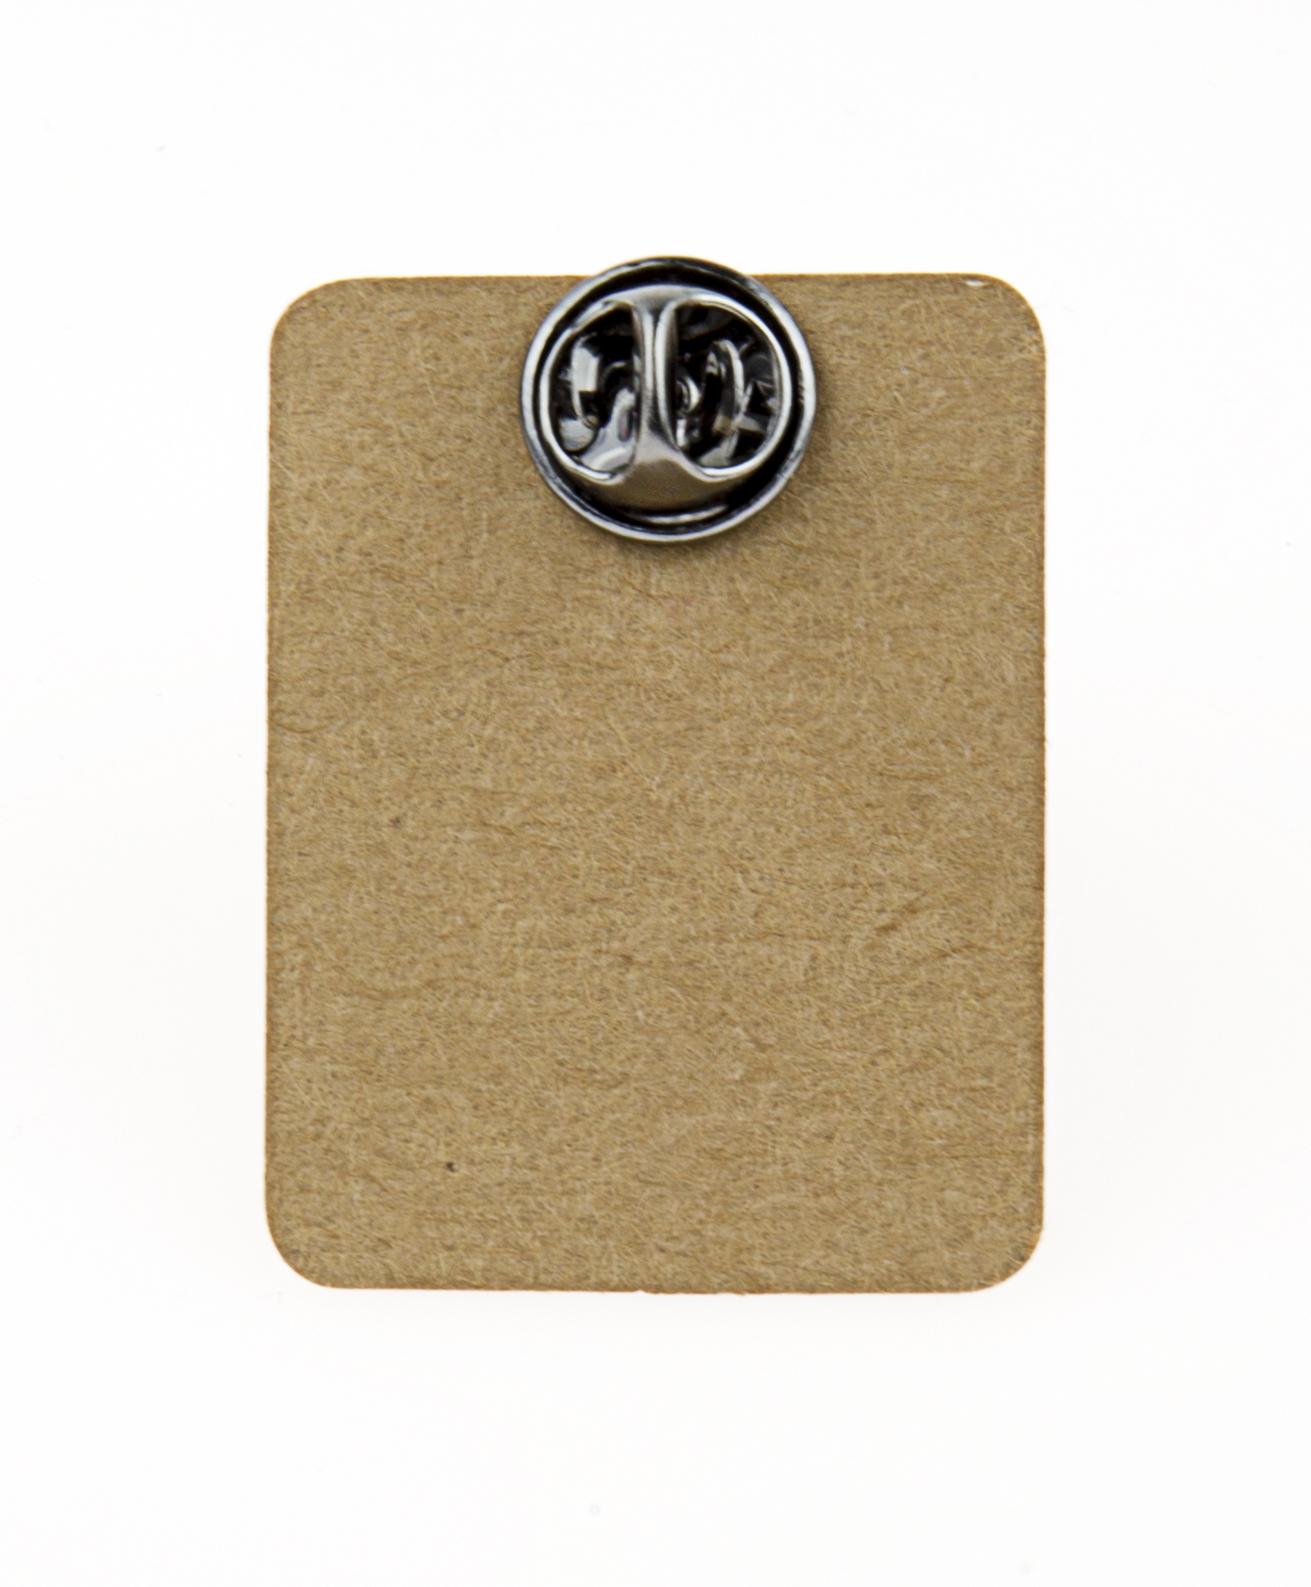 Metal Whale Enamel Pin Badge